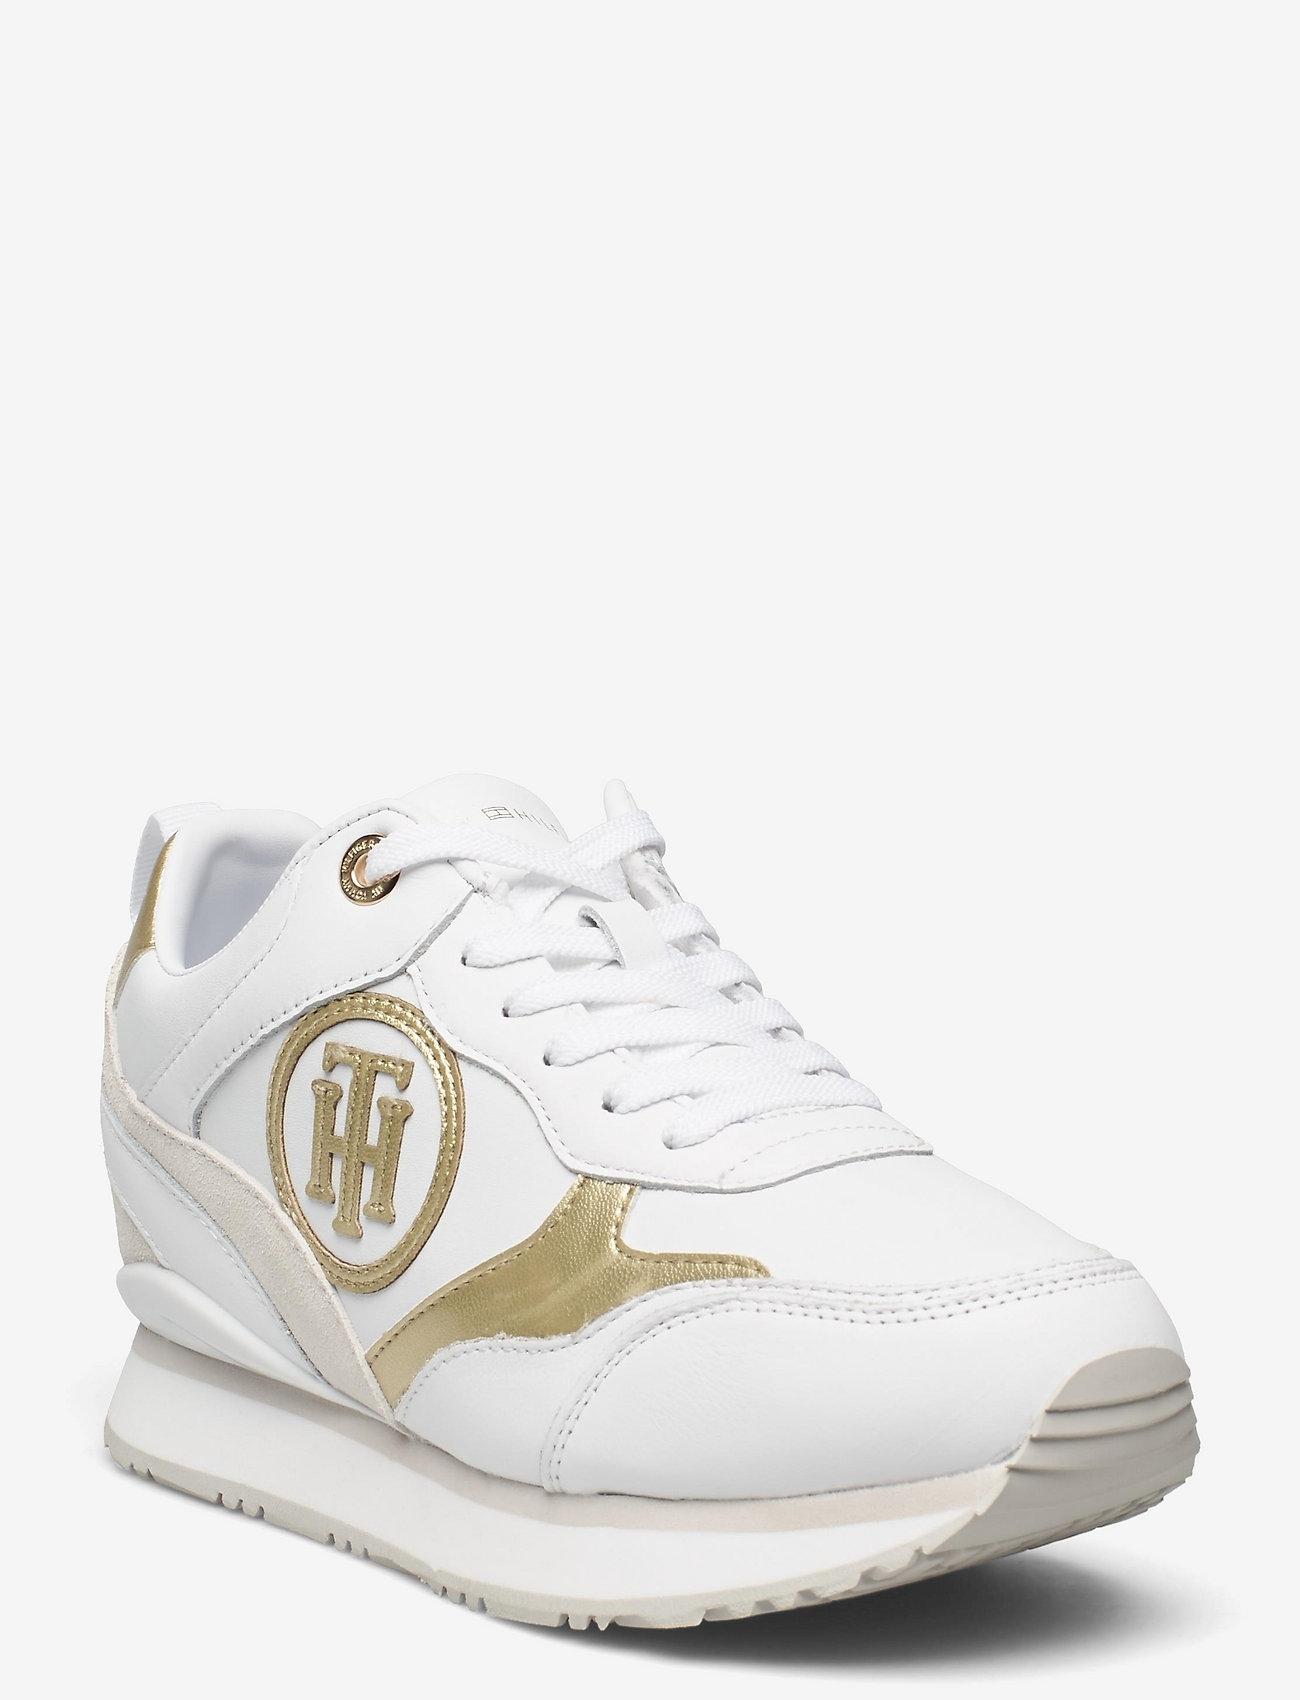 Tommy Hilfiger - METALLIC DRESSY WEDGE SNEAKER - low top sneakers - white - 0